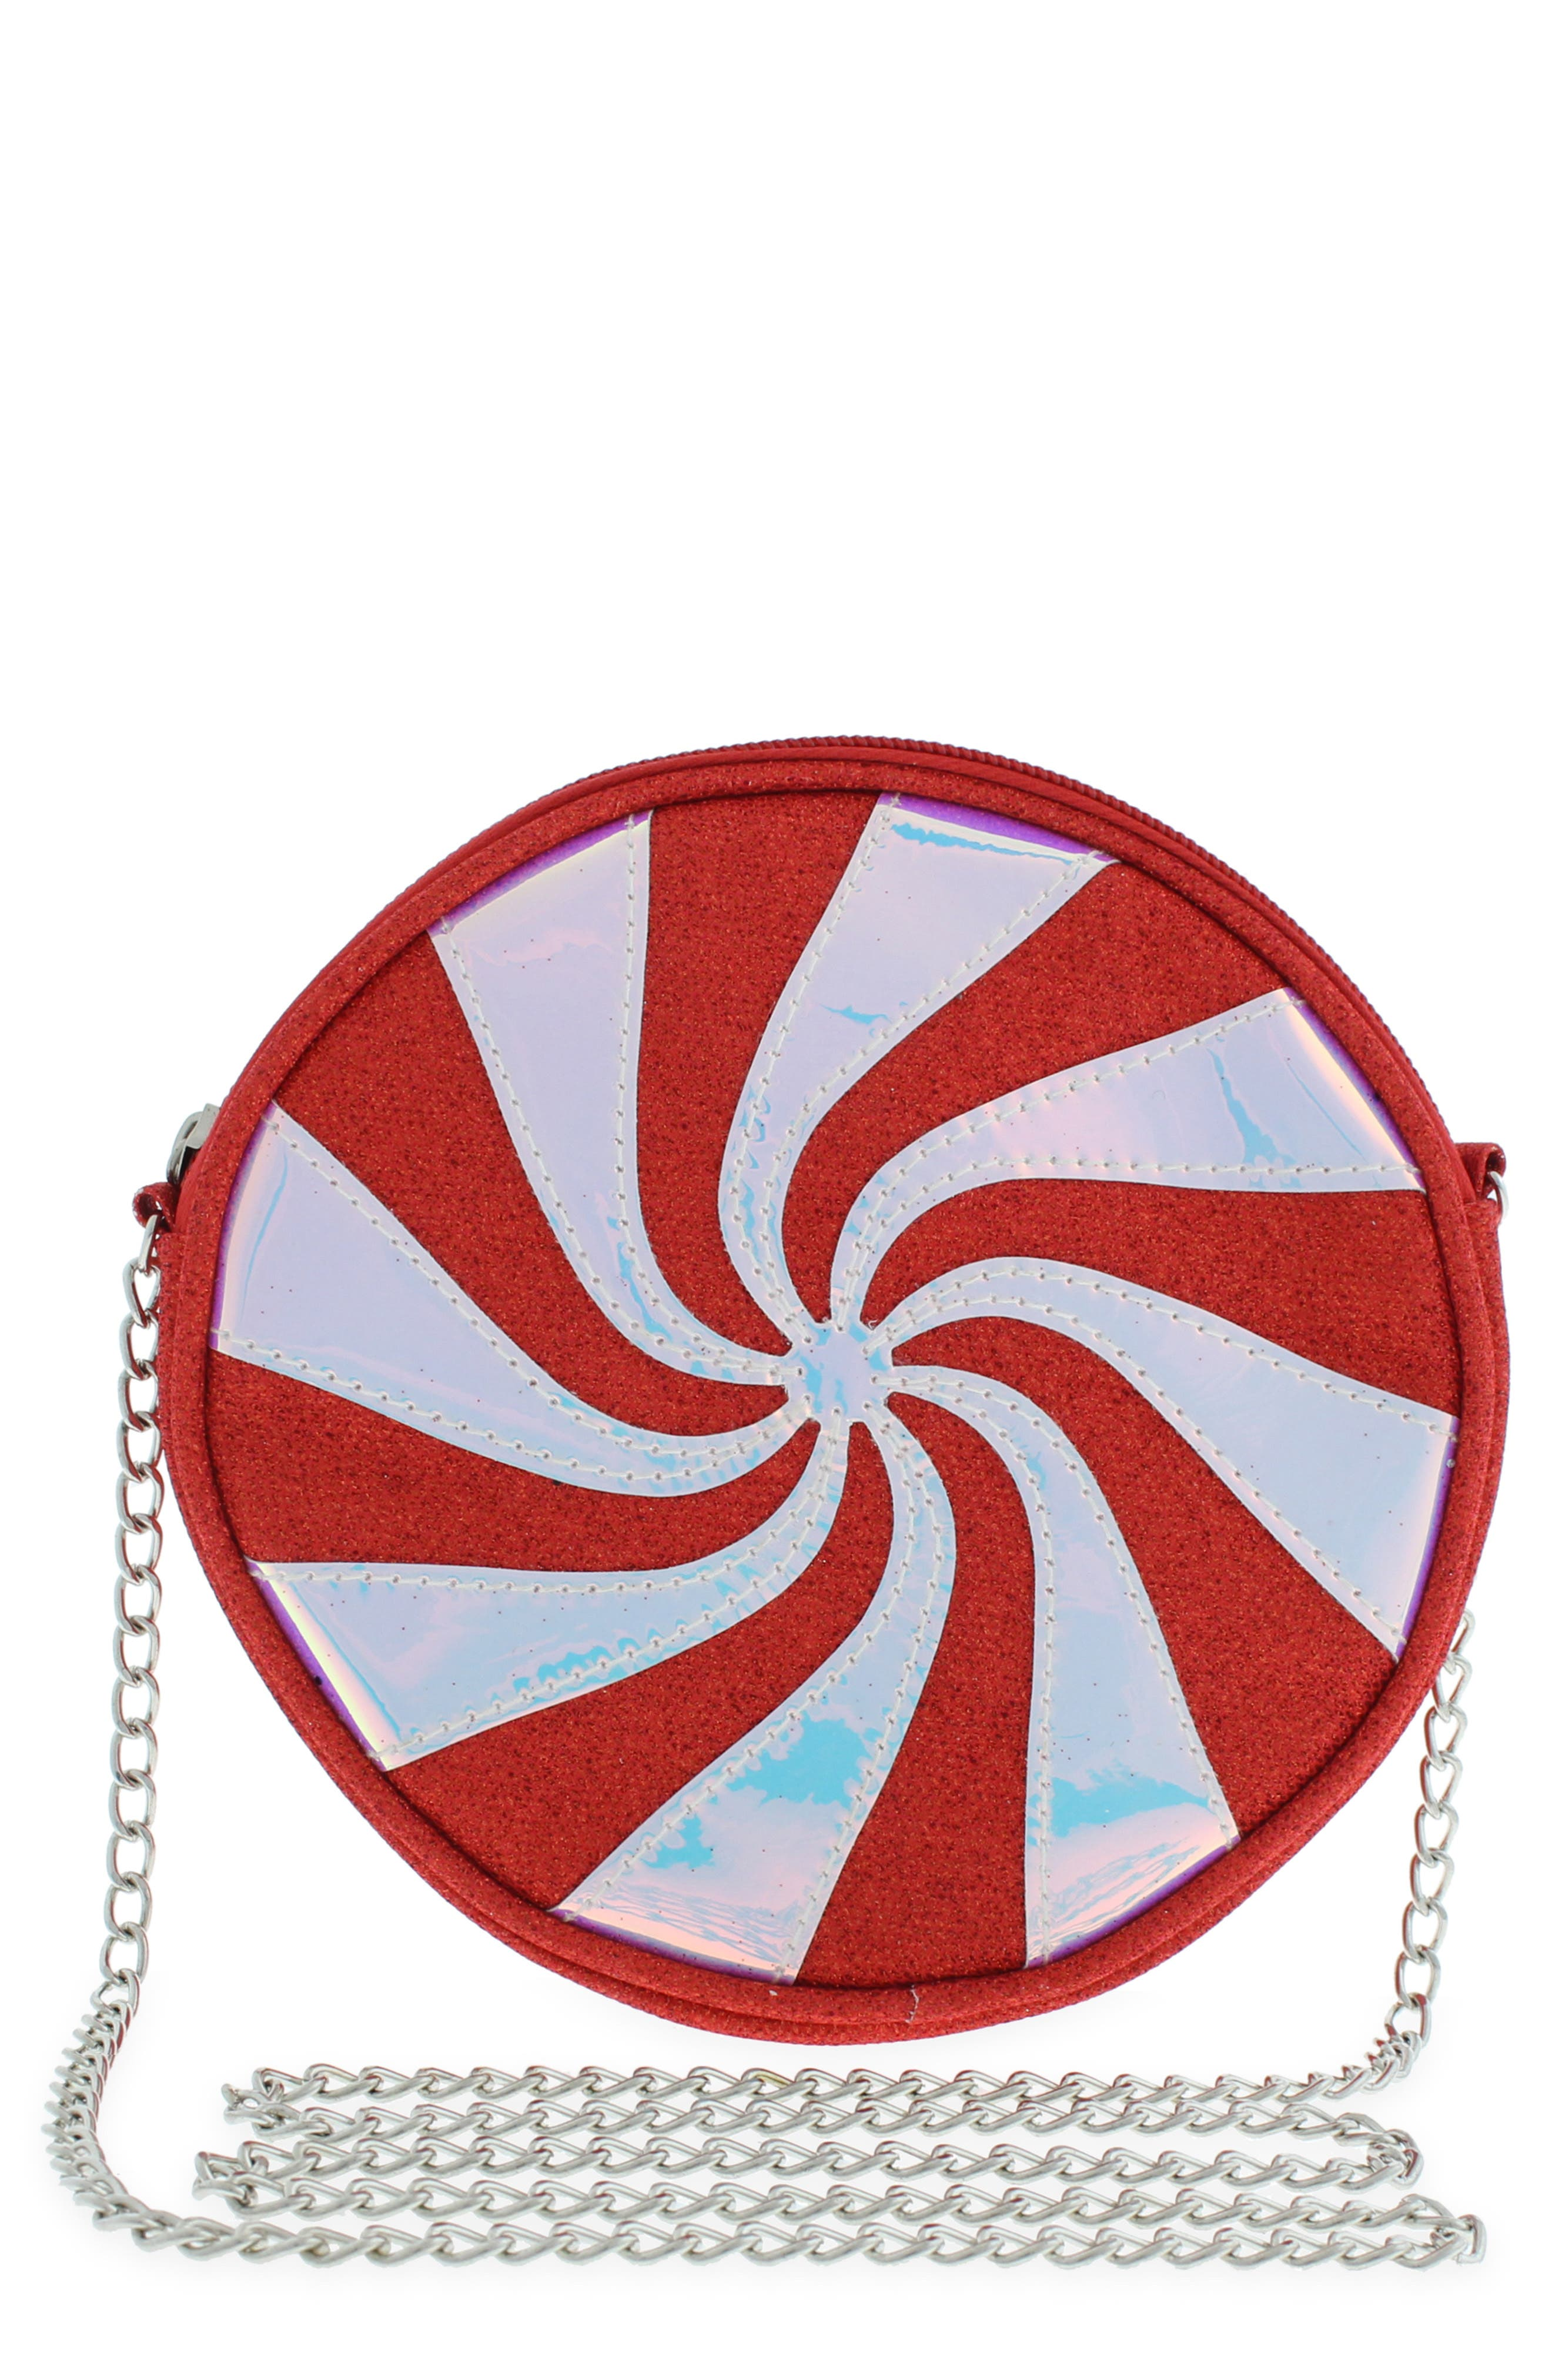 Girls Capelli New York Peppermint Crossbody Bag  Red